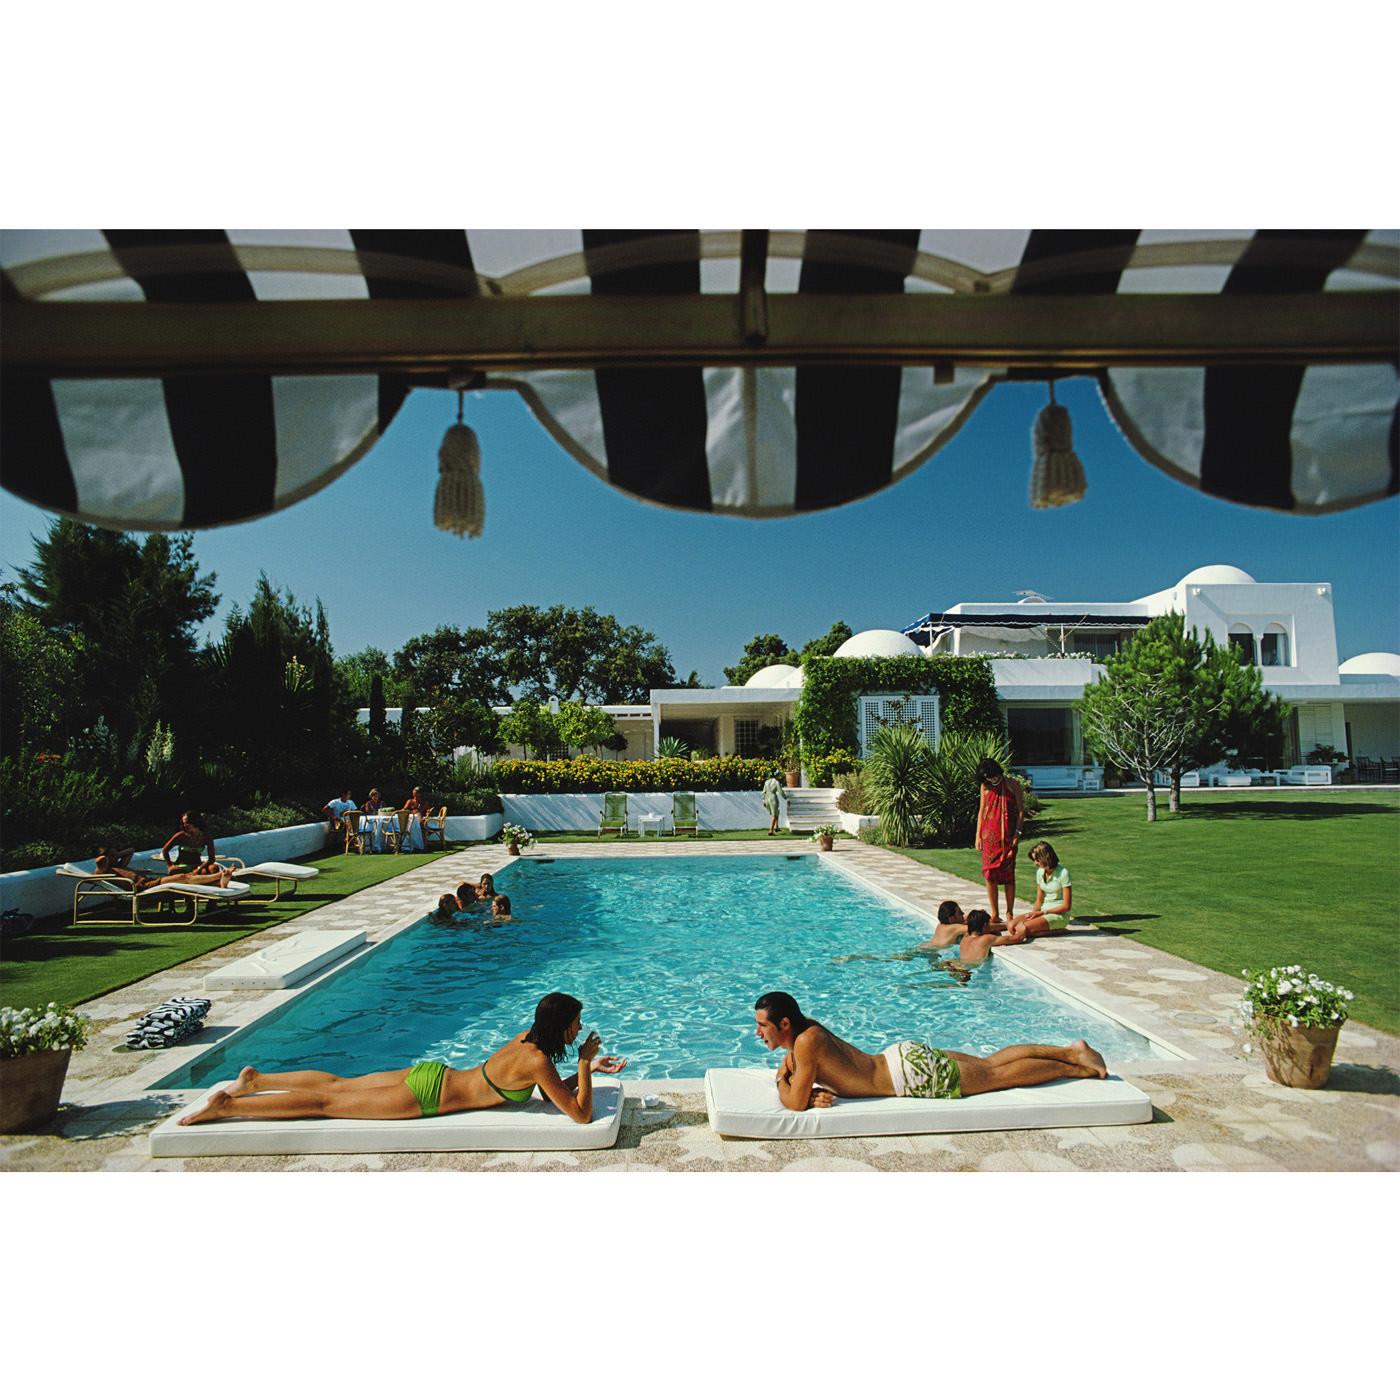 Slim Aarons Poolside Sotogrande Wall Art | Jonathan Adler